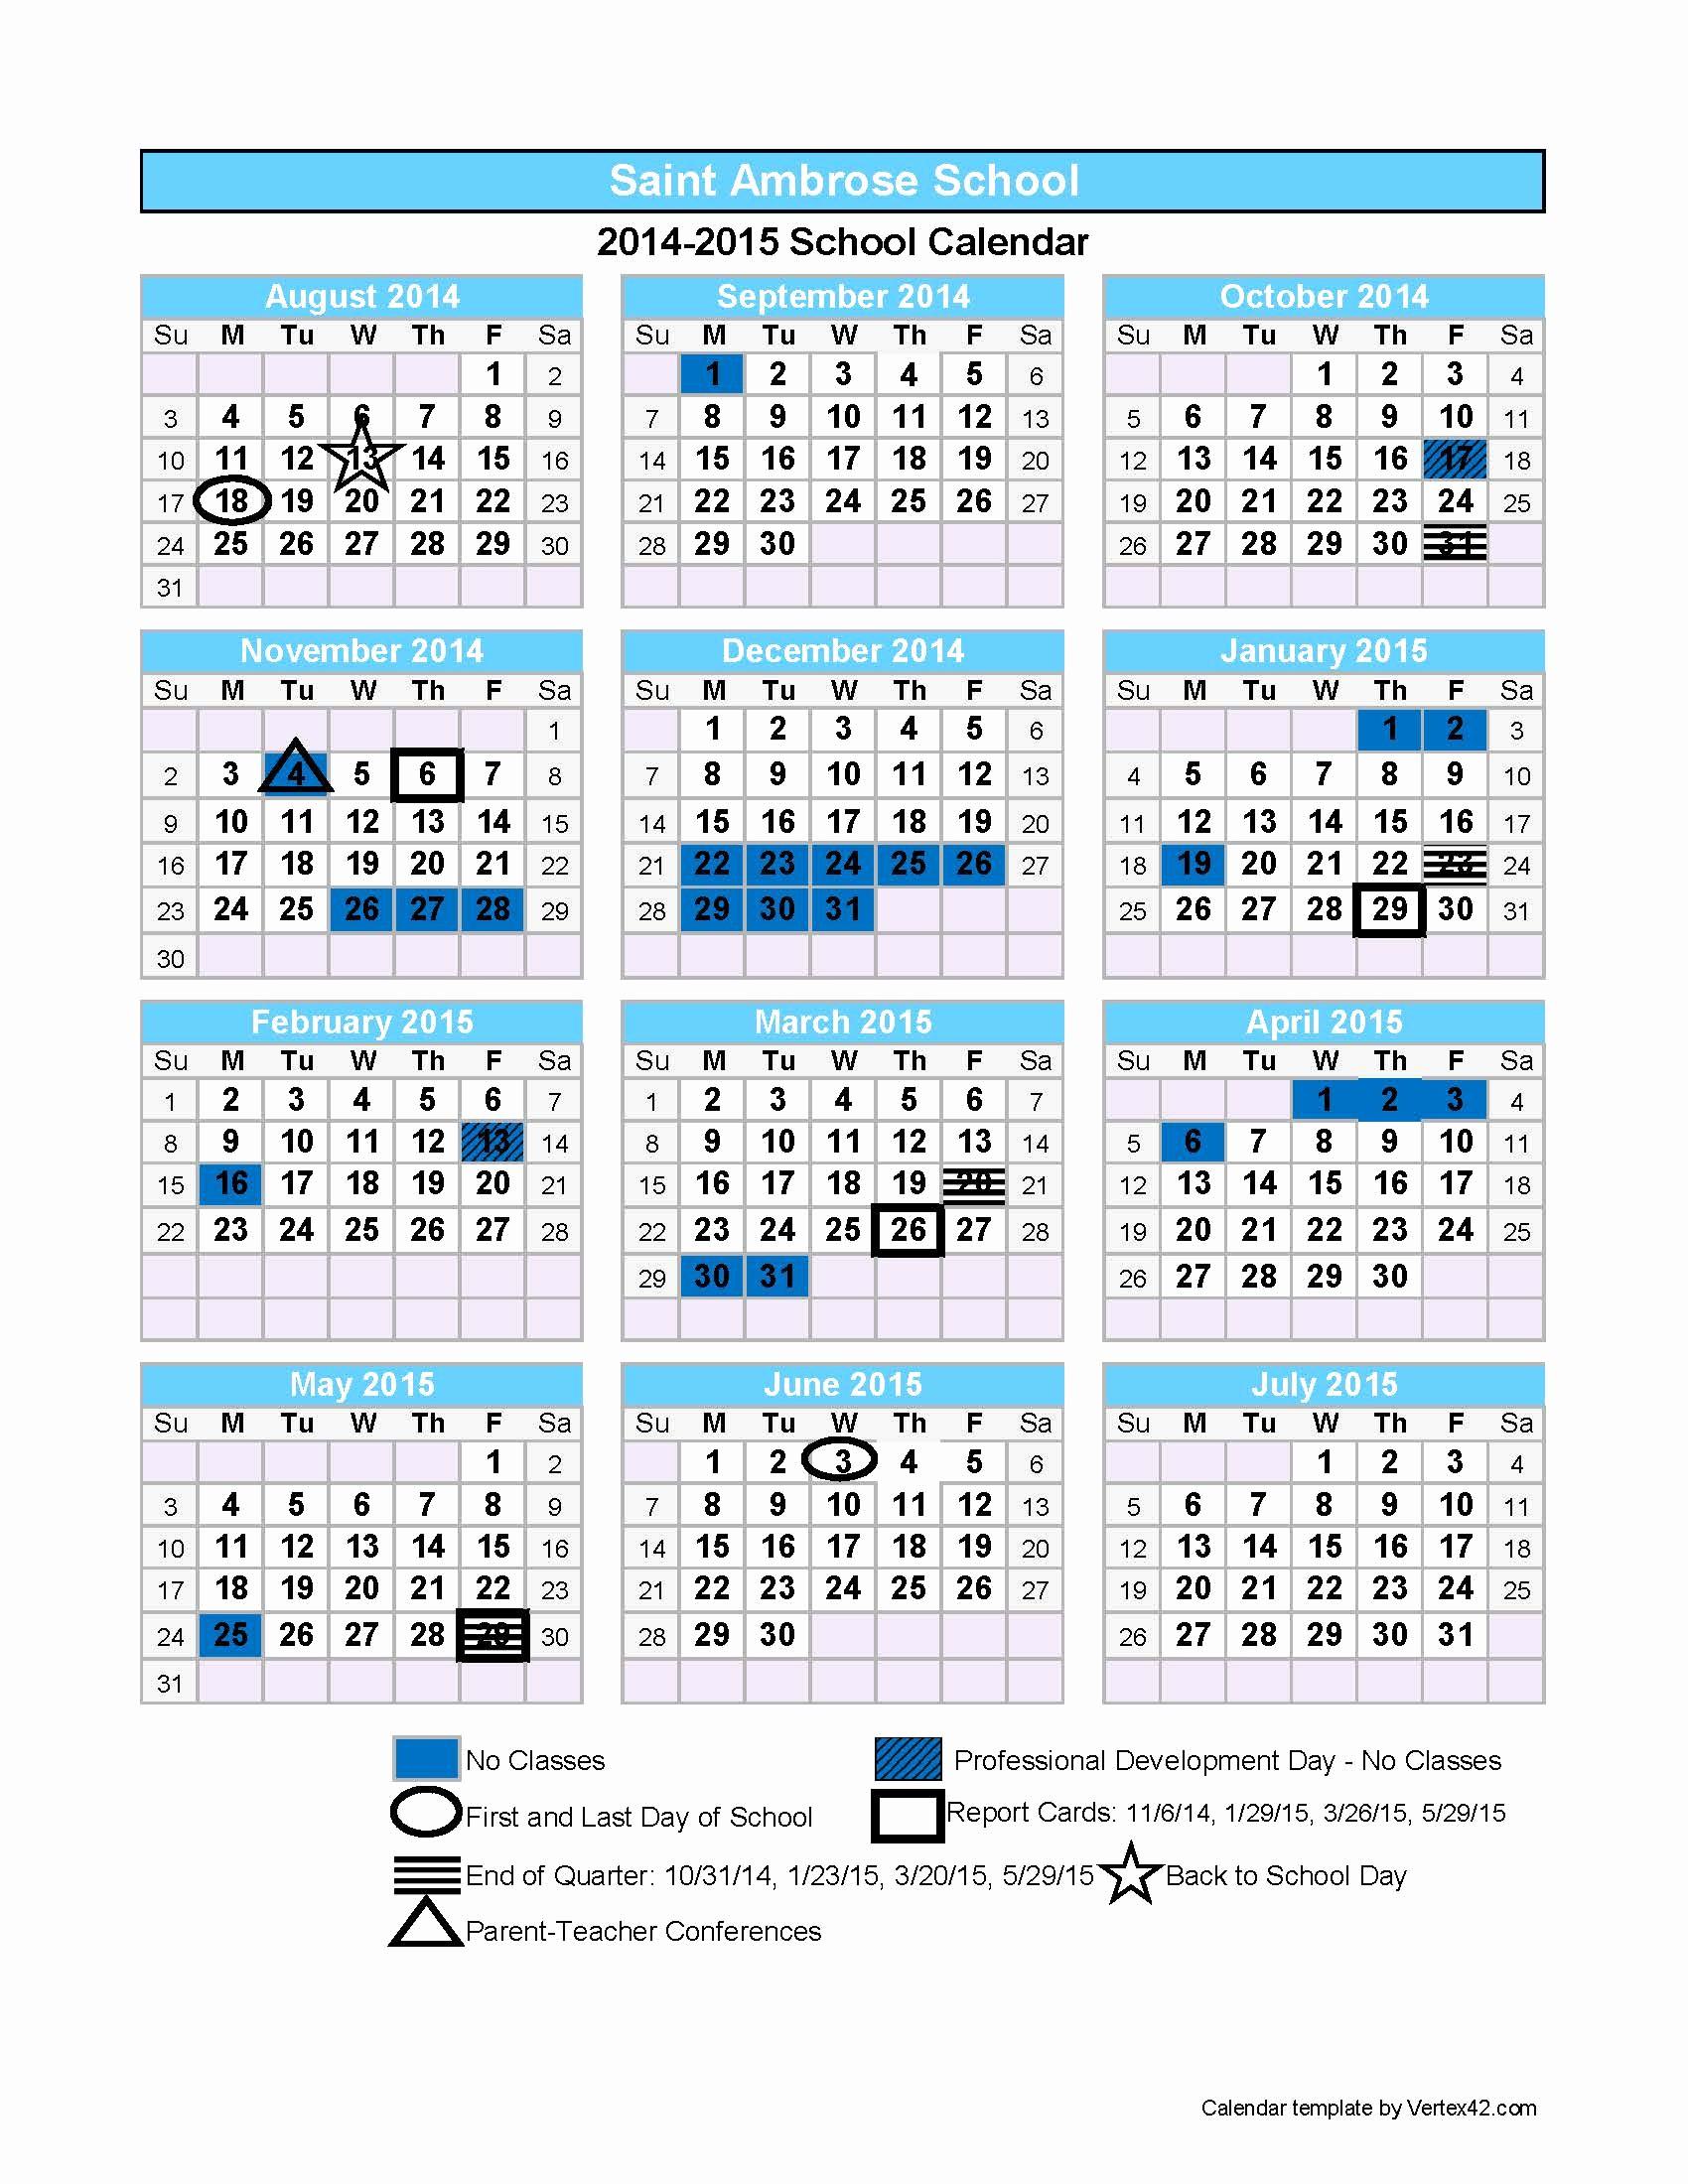 Hisd Calendar 2018 Search Results for Calender 2014 to 2015 Calendar 2015